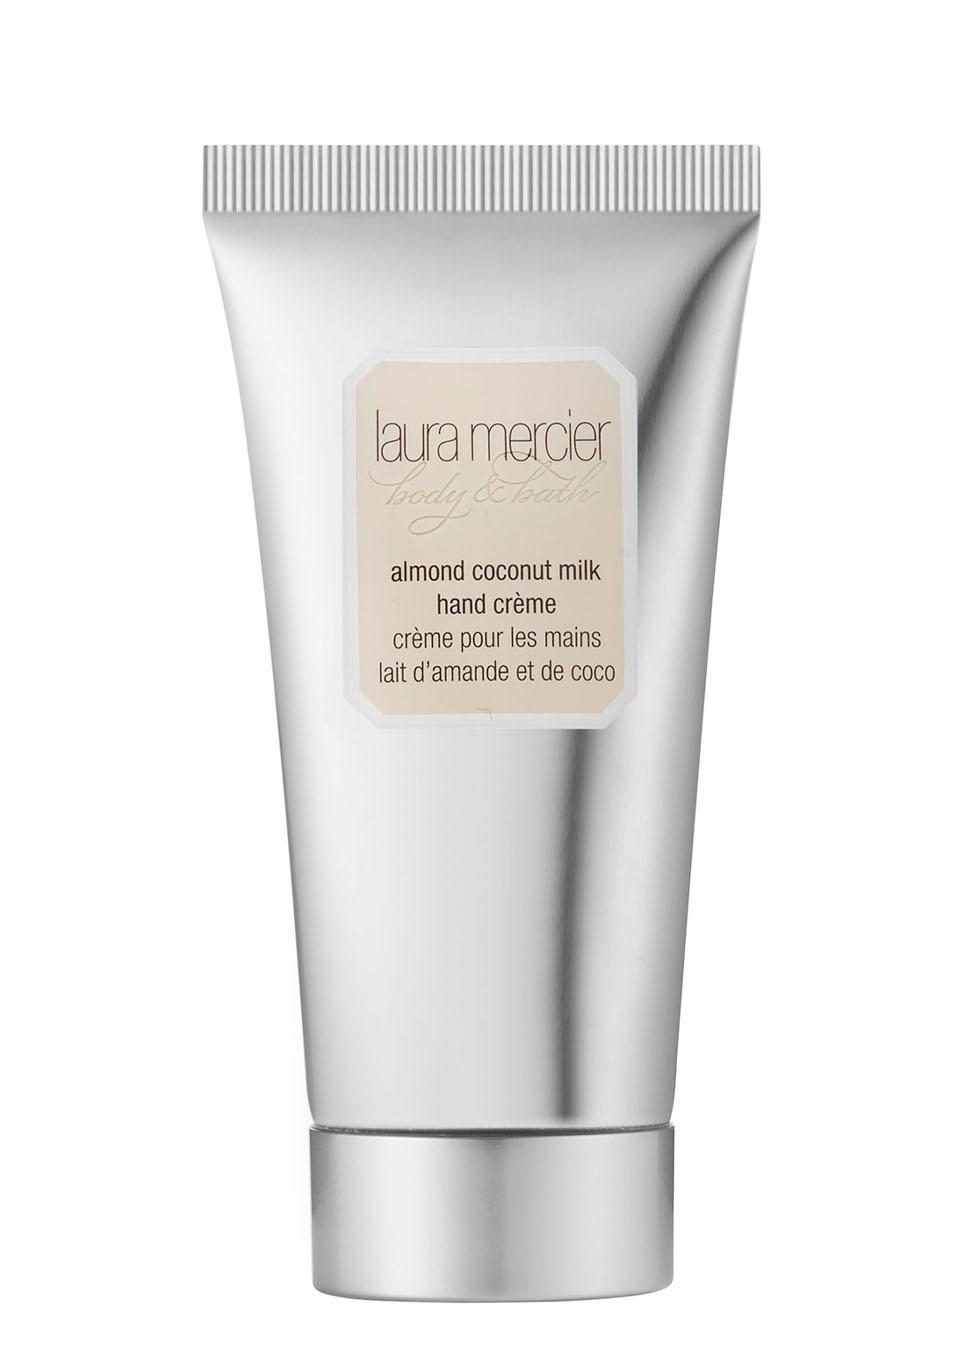 Laura Mercier Ambre Vanillè Hand Cream | Handcream